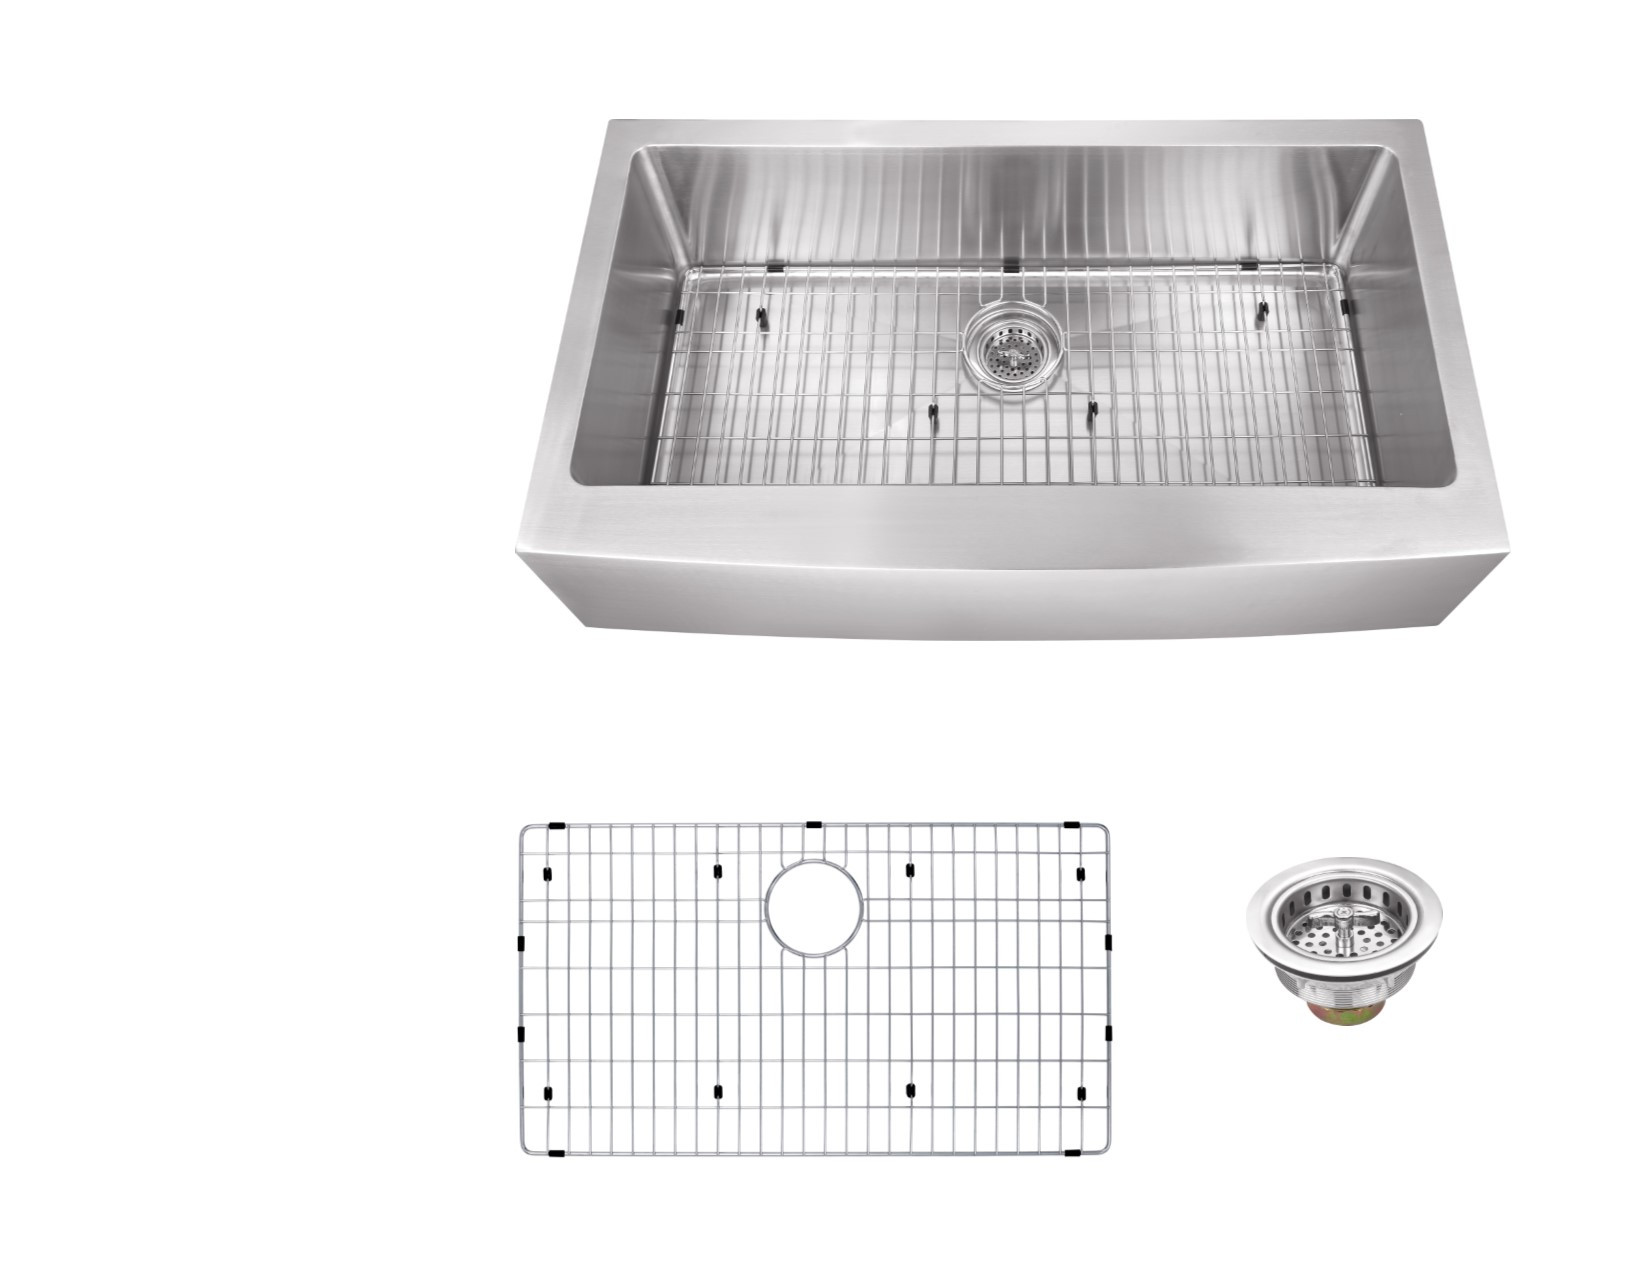 Cahaba CA231SB3516 Gauge Apron Front Single Bowl Kitchen Sink With Grid Set